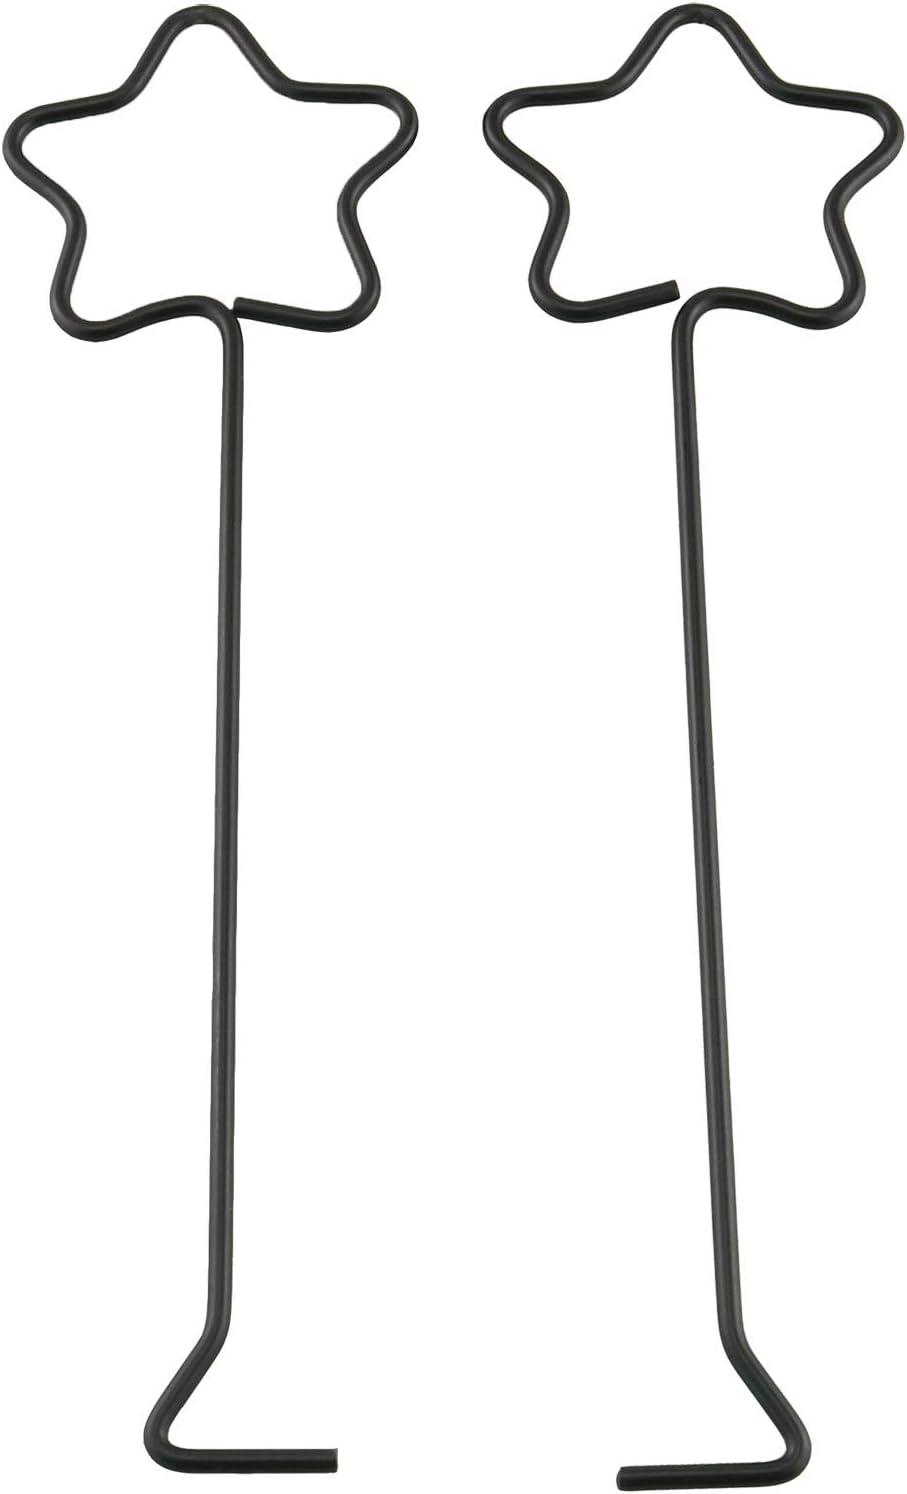 HJ Garden 2PCS Star Wick Dipper/Snuffer, Star Candle Hook (Black)